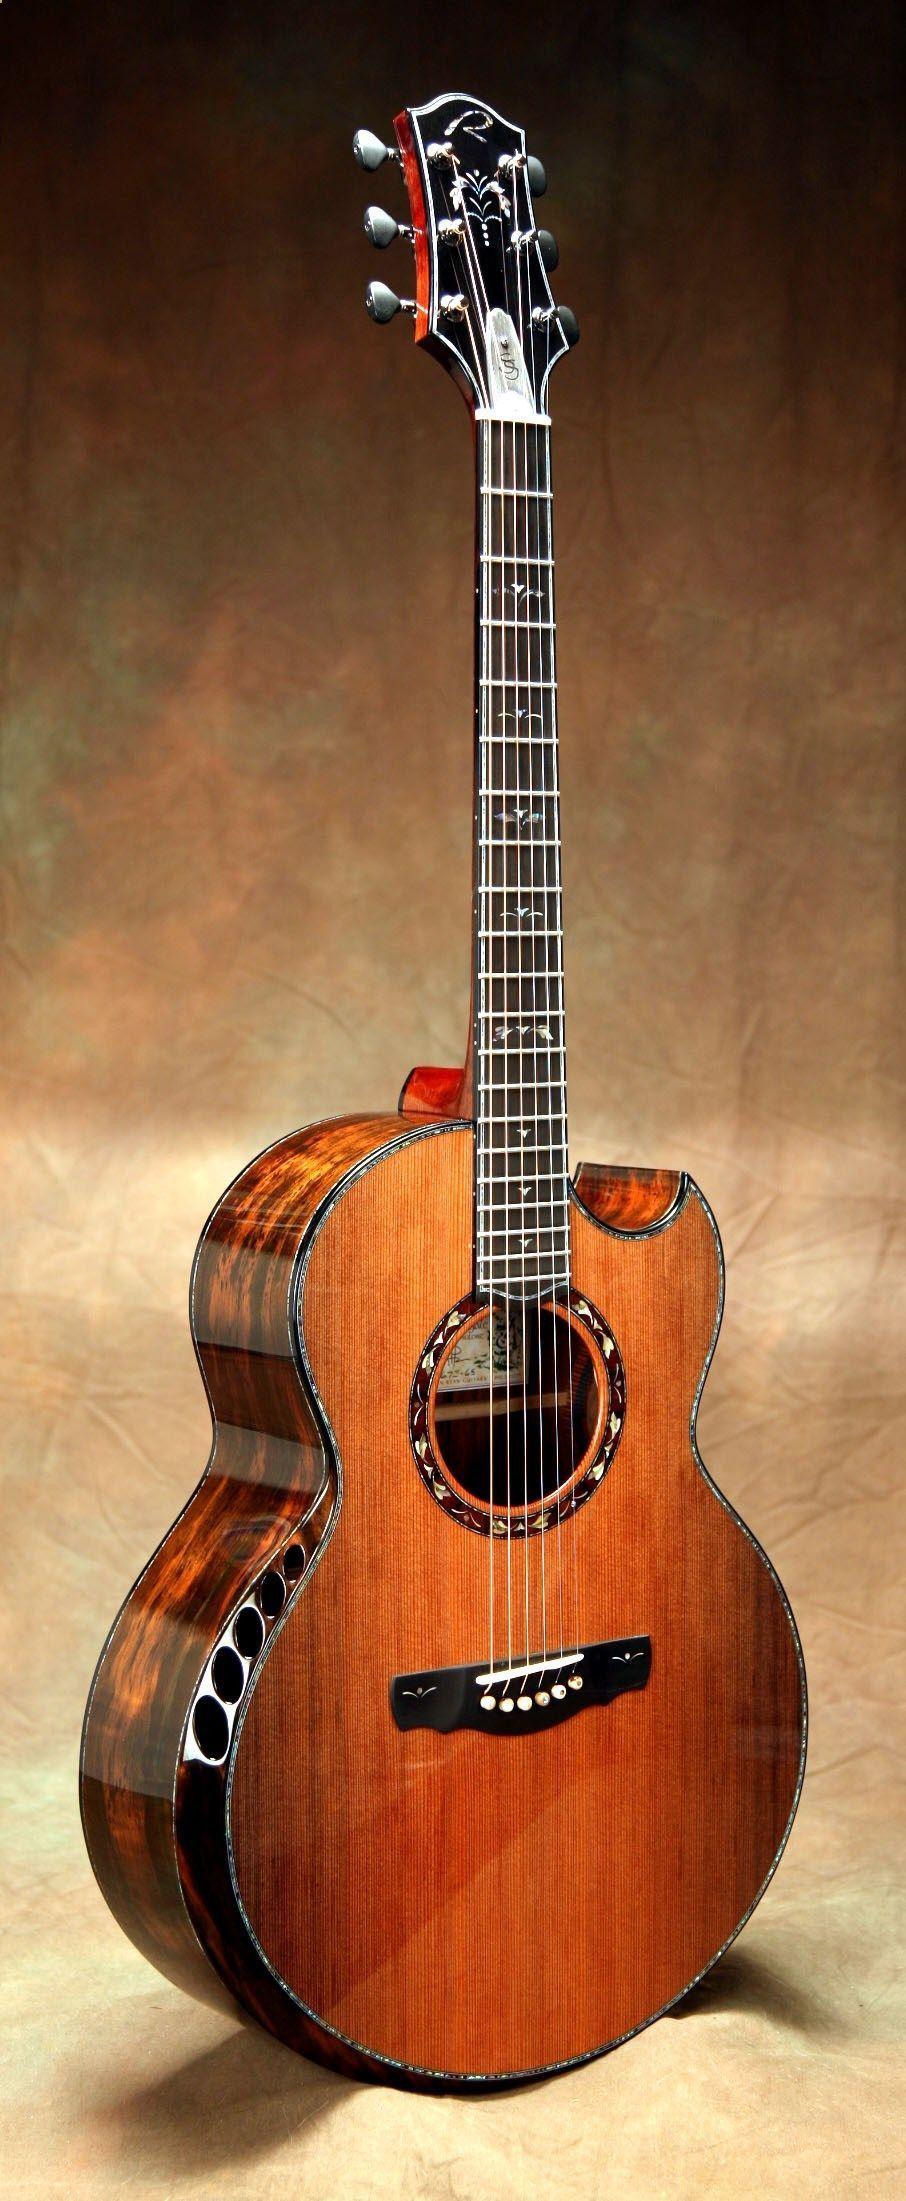 Acoustic Guitar Bench Press Kevin Ryan Guitars The Fretboard Journal Keepsake Magazine For Guitar Coll Acoustic Guitar Guitar Acoustic Guitar Photography